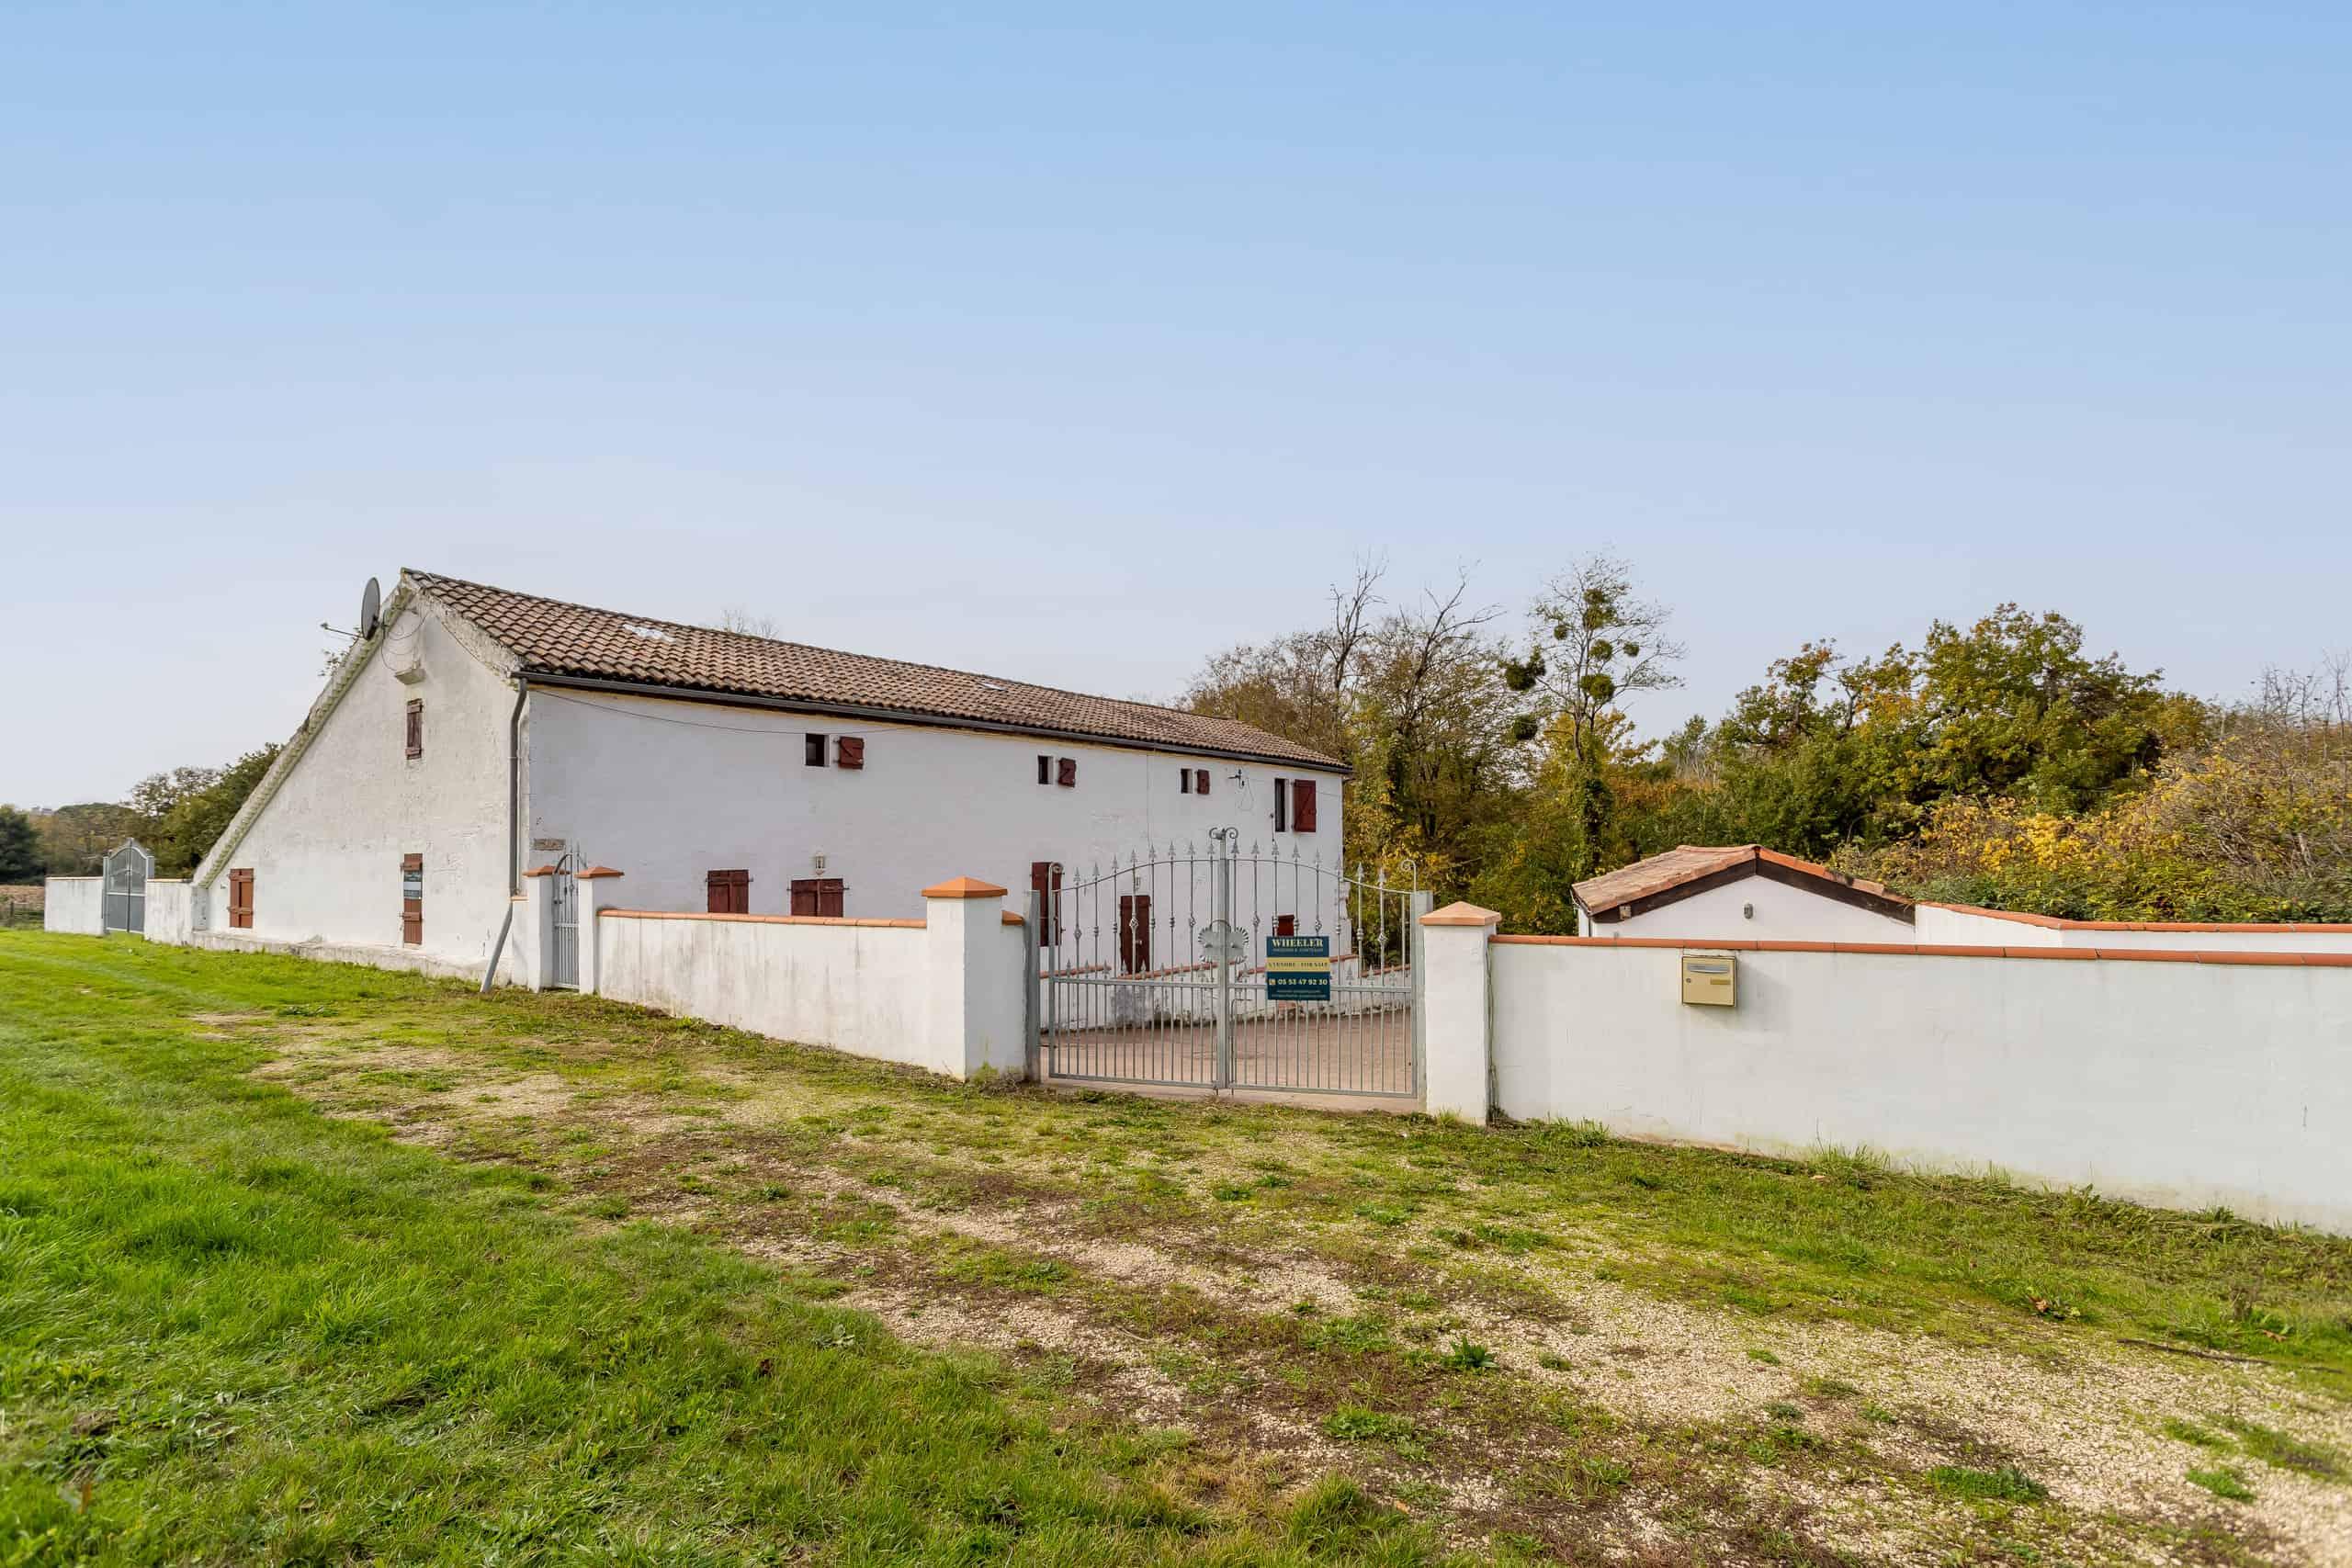 Stone farmhouse near vineyards